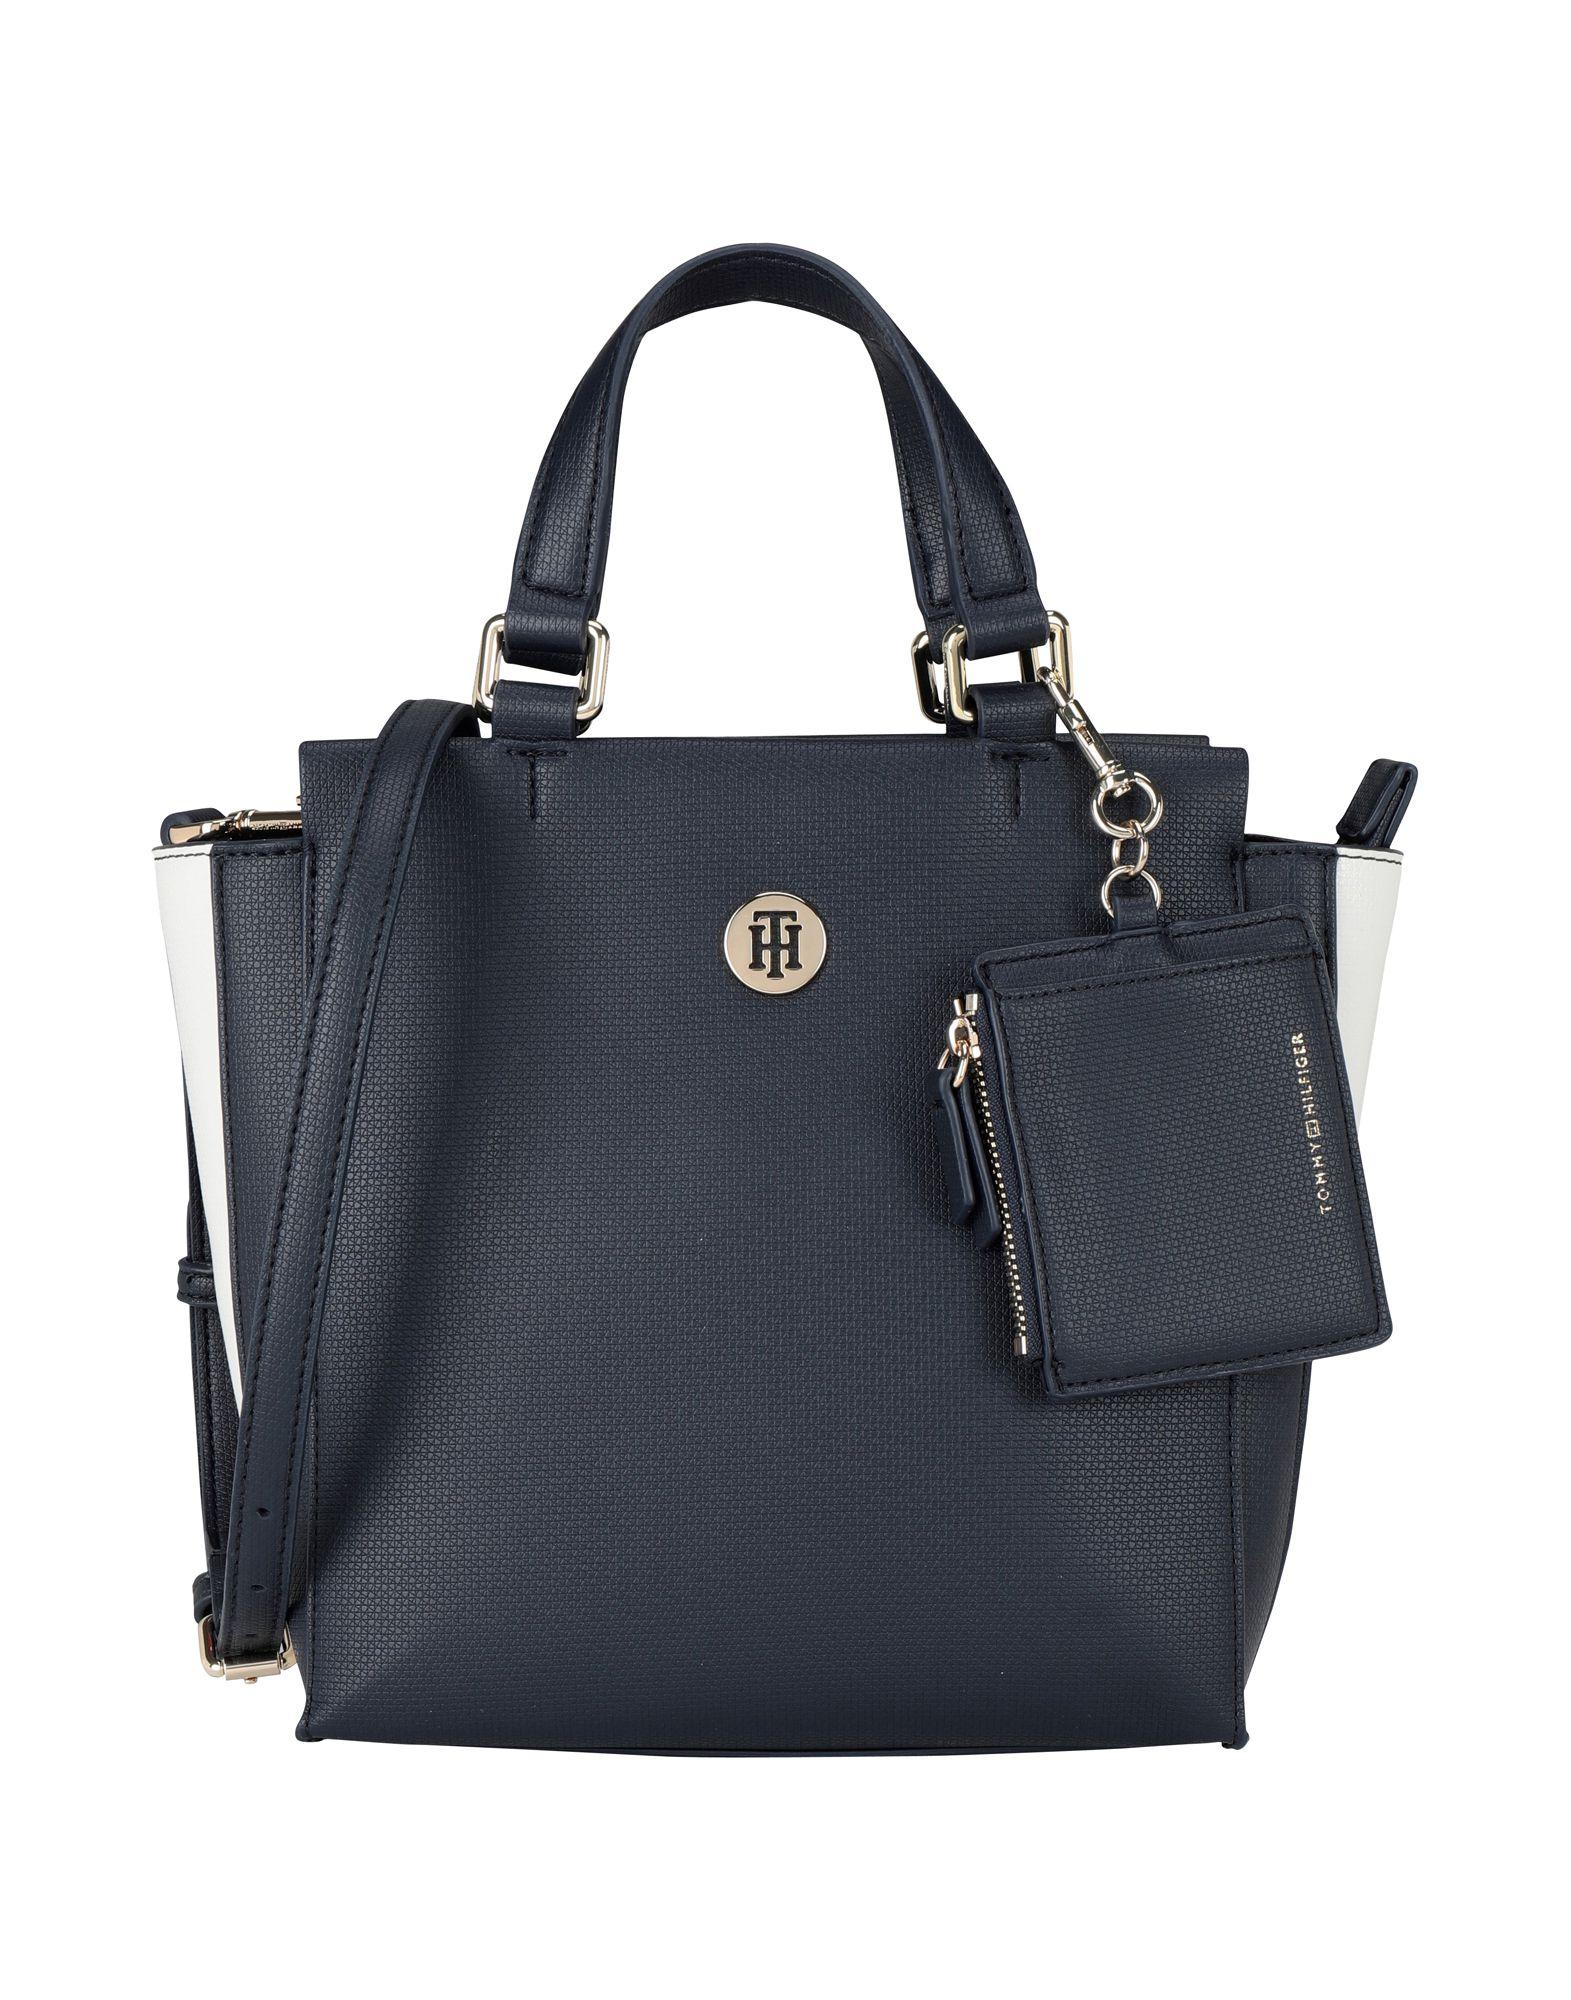 4a865d4c Tommy Hilfiger Effortless-Saffiano - Handbag - Women Tommy Hilfiger Handbags  online on YOOX Australia - 45443917TT